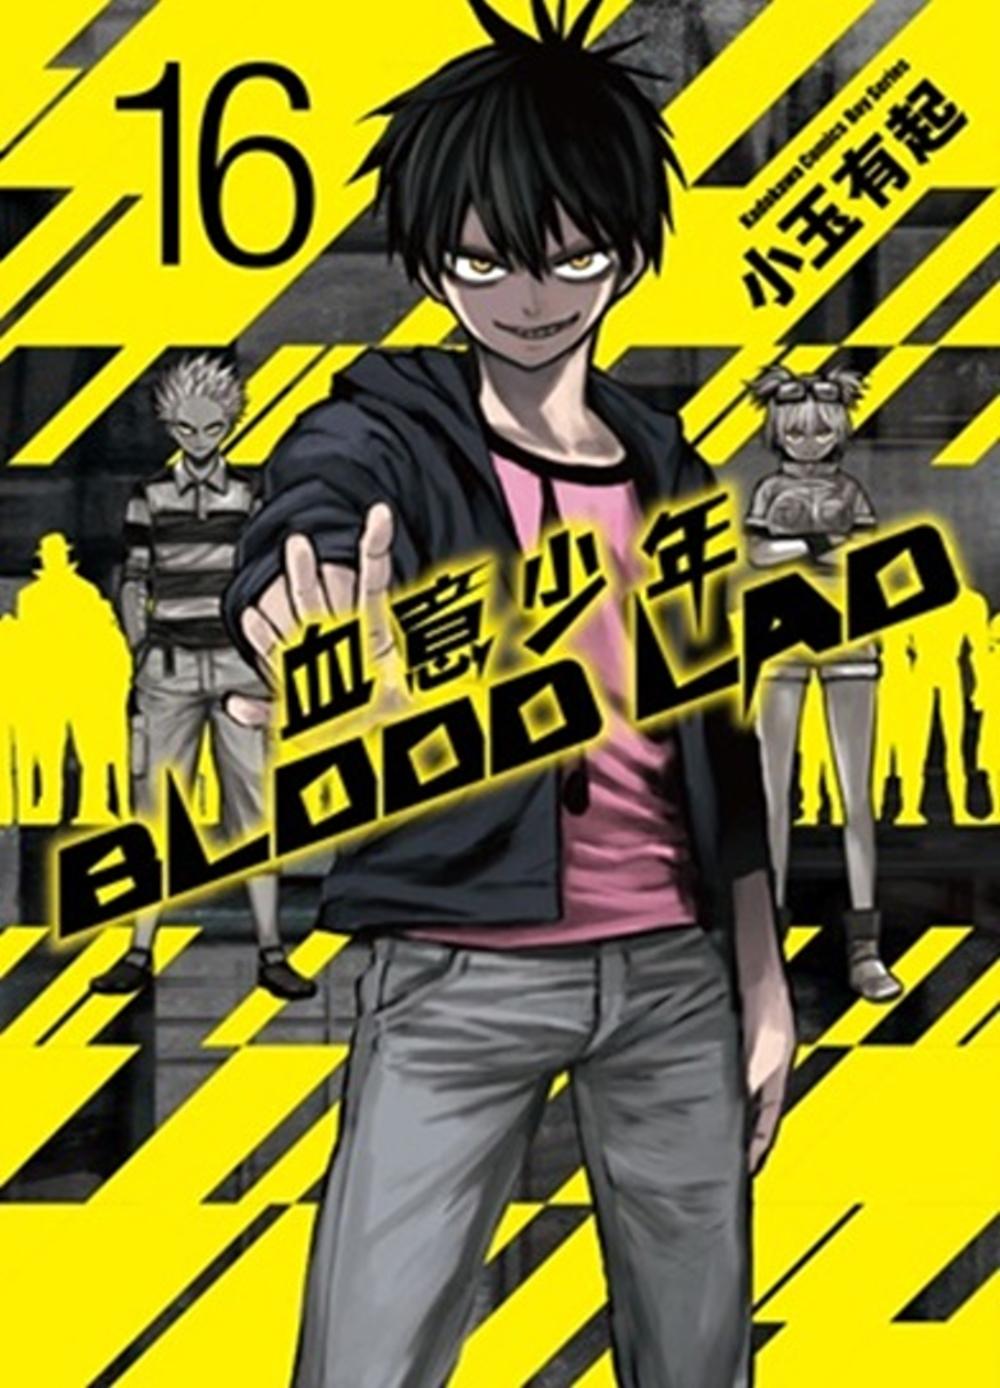 BLOOD LAD 血意少年 ...